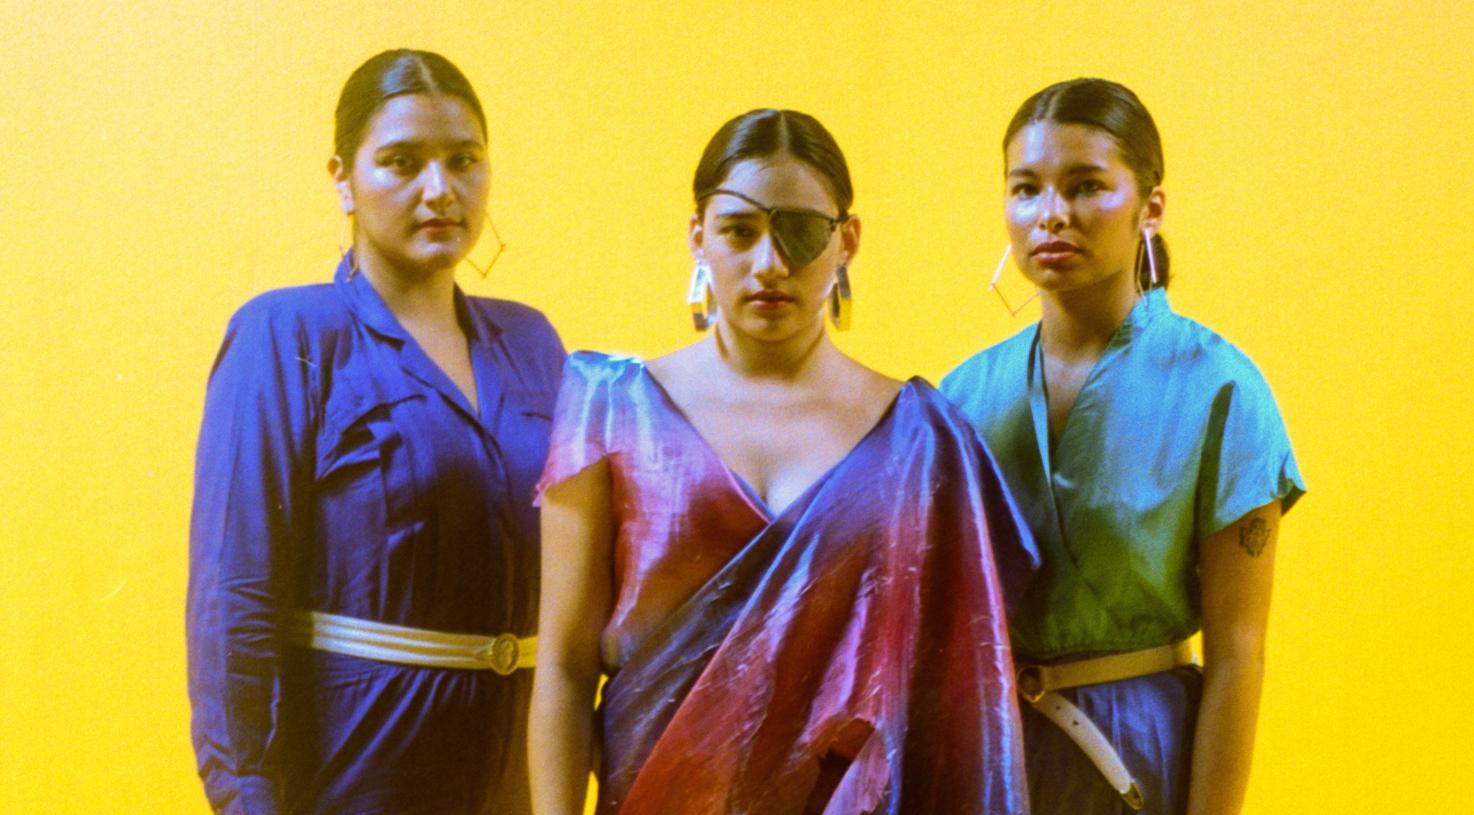 TRAILER: 'Chicana Stardust' Is a Tijuana-Set Sci-Fi Film Featuring an Eye Patch-Wearing Alien